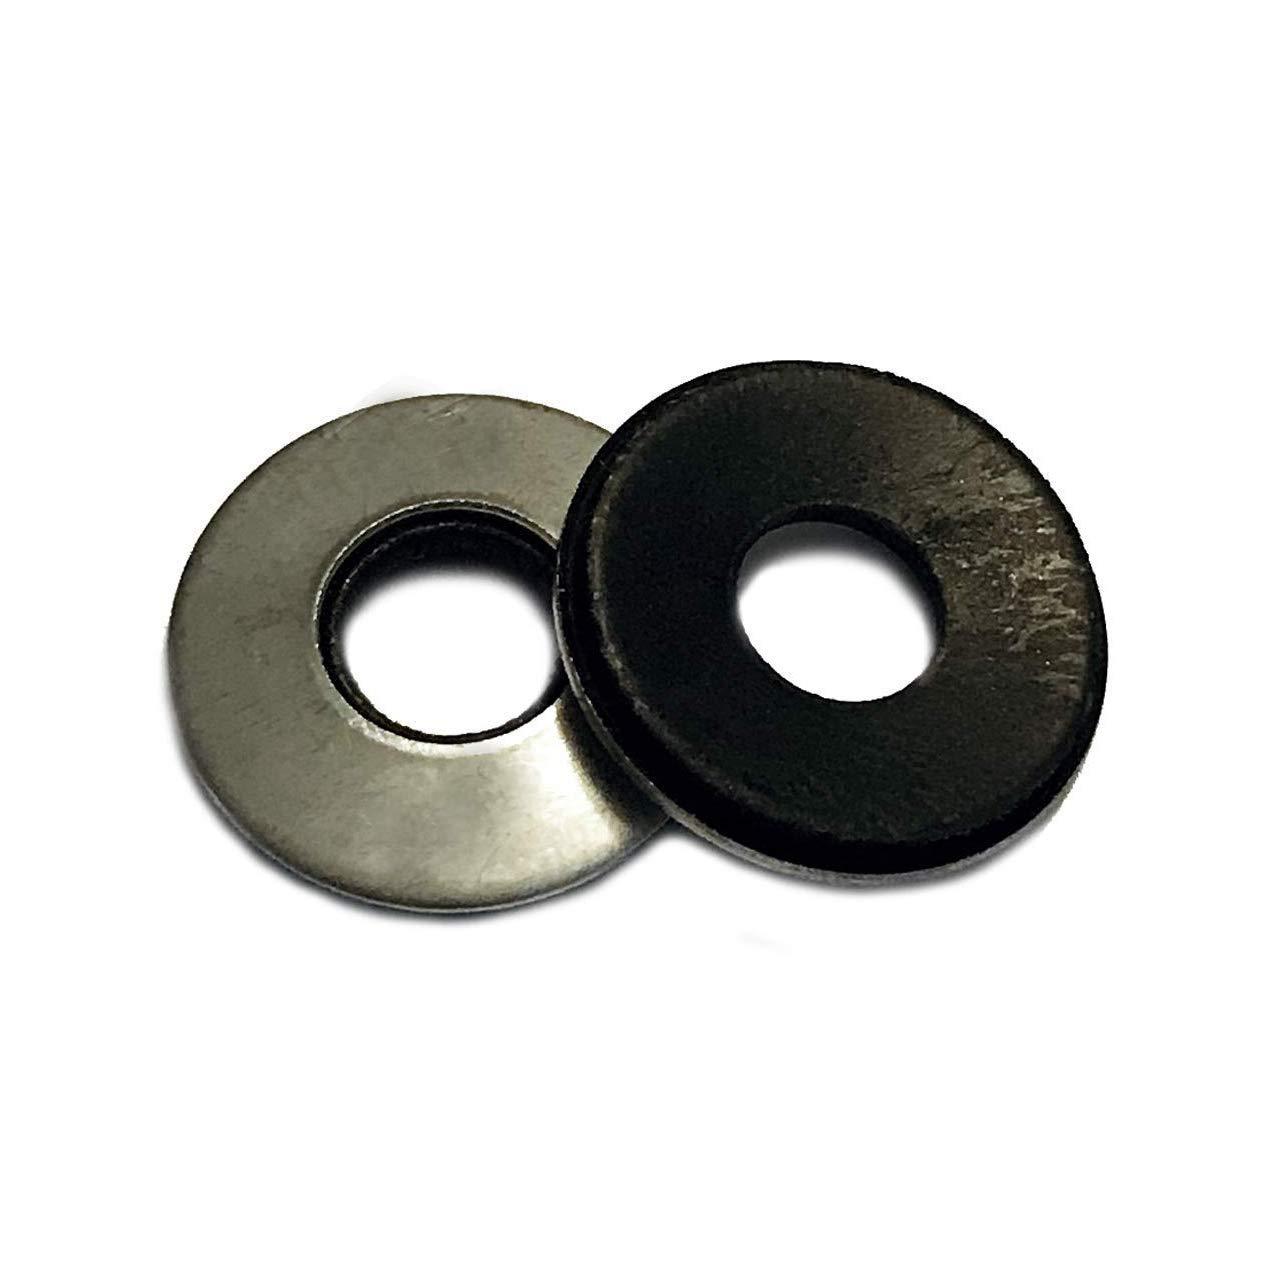 316 Stainless Steel 1/2'' Neoprene Bonded Sealing Washers 25 Qty by Bridge Fasteners